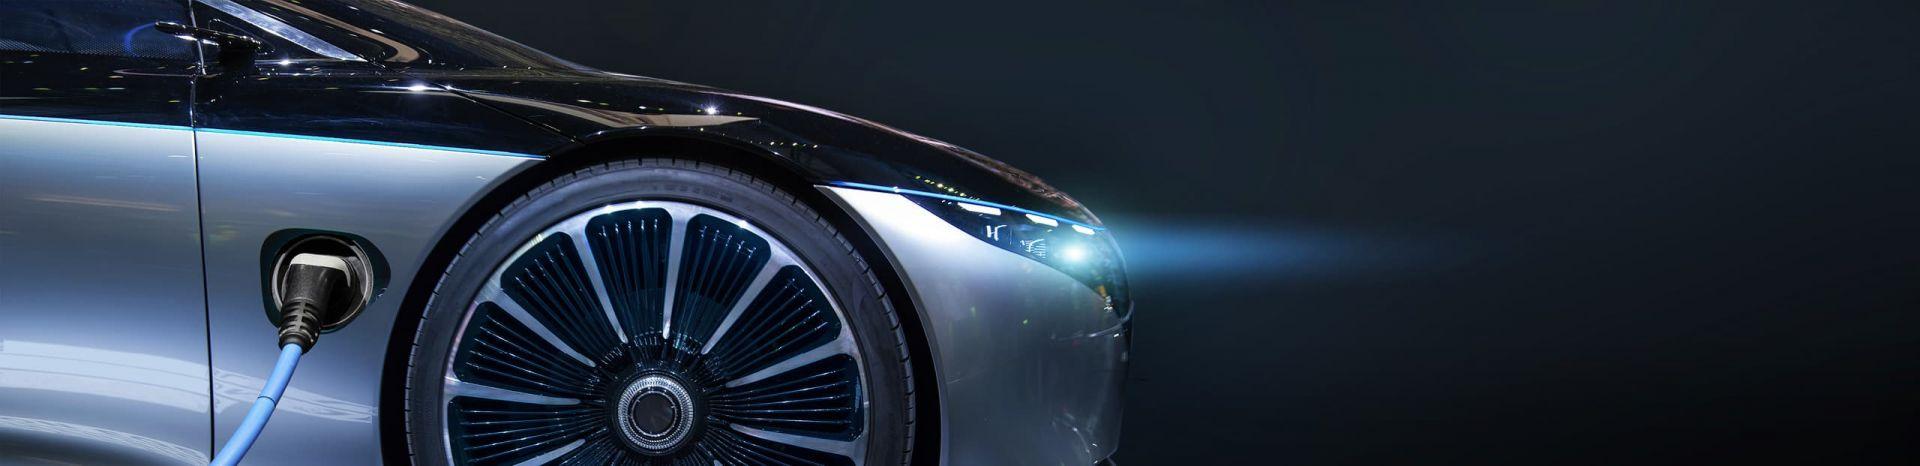 Header_Automotive